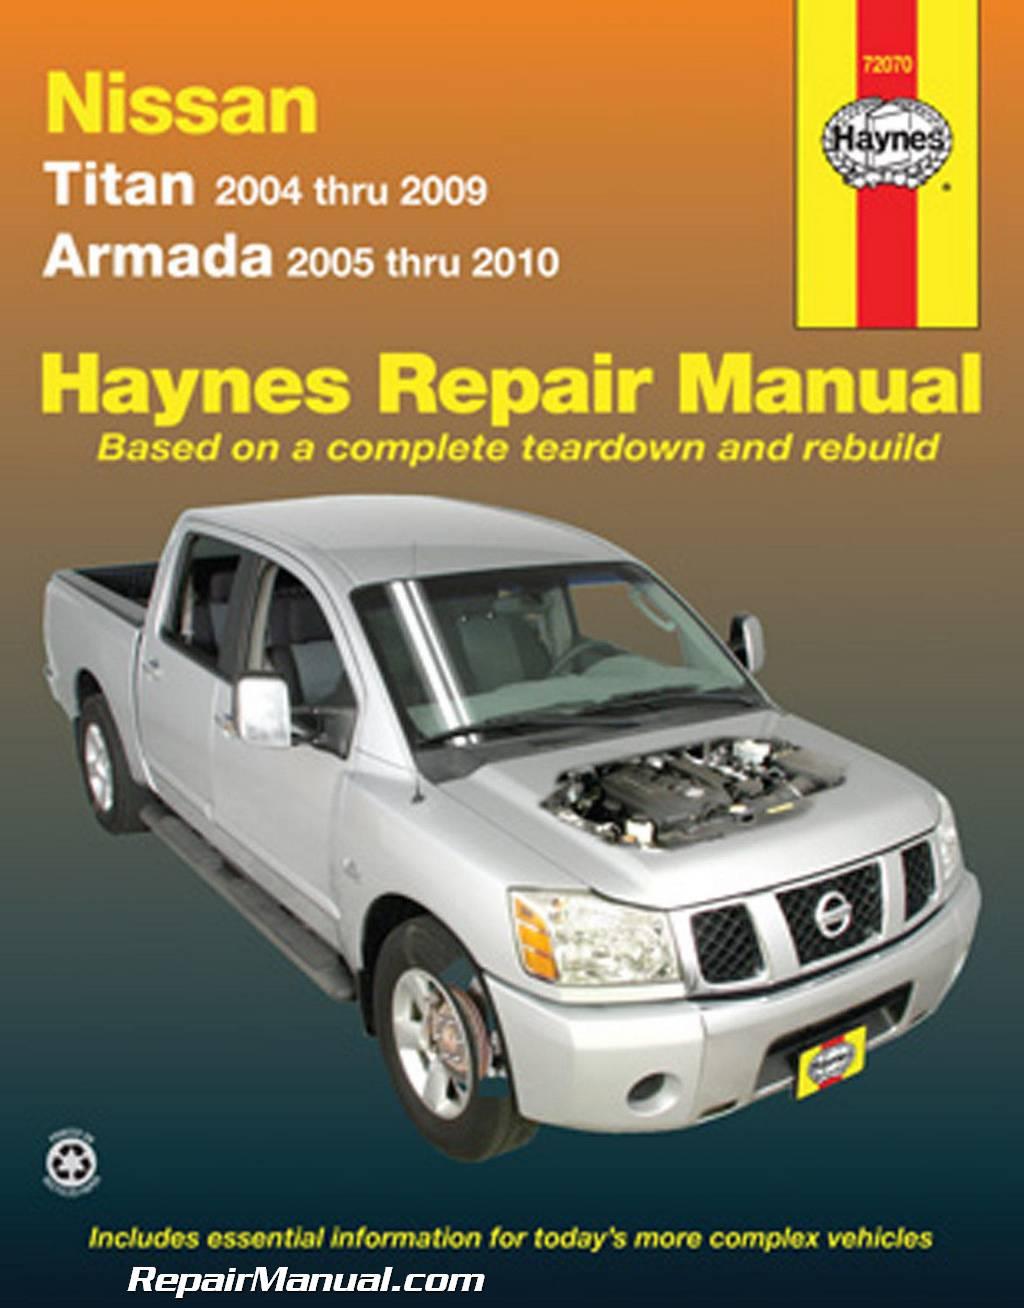 haynes 2004 2009 nissan titan 2005 2010 nissan armada auto repair manual rh repairmanual com 2010 Titan MPG 2010 Nissan Titan 4 Door